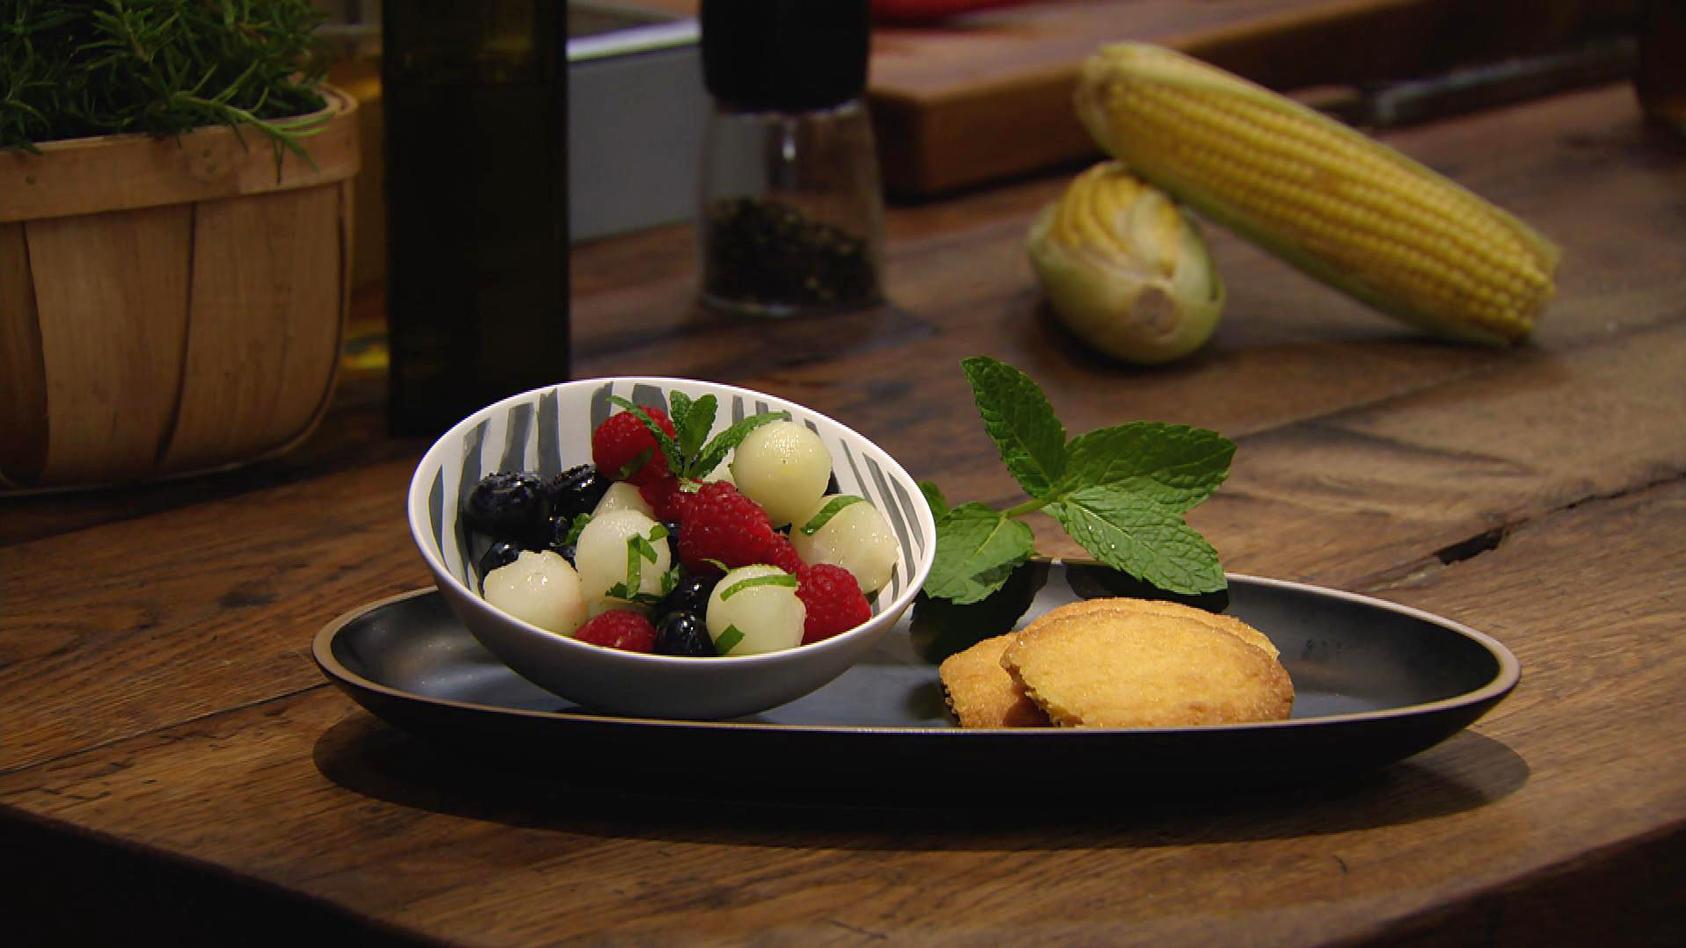 Mach mal Mais!: Polenta-Kekse mit Obstsalat